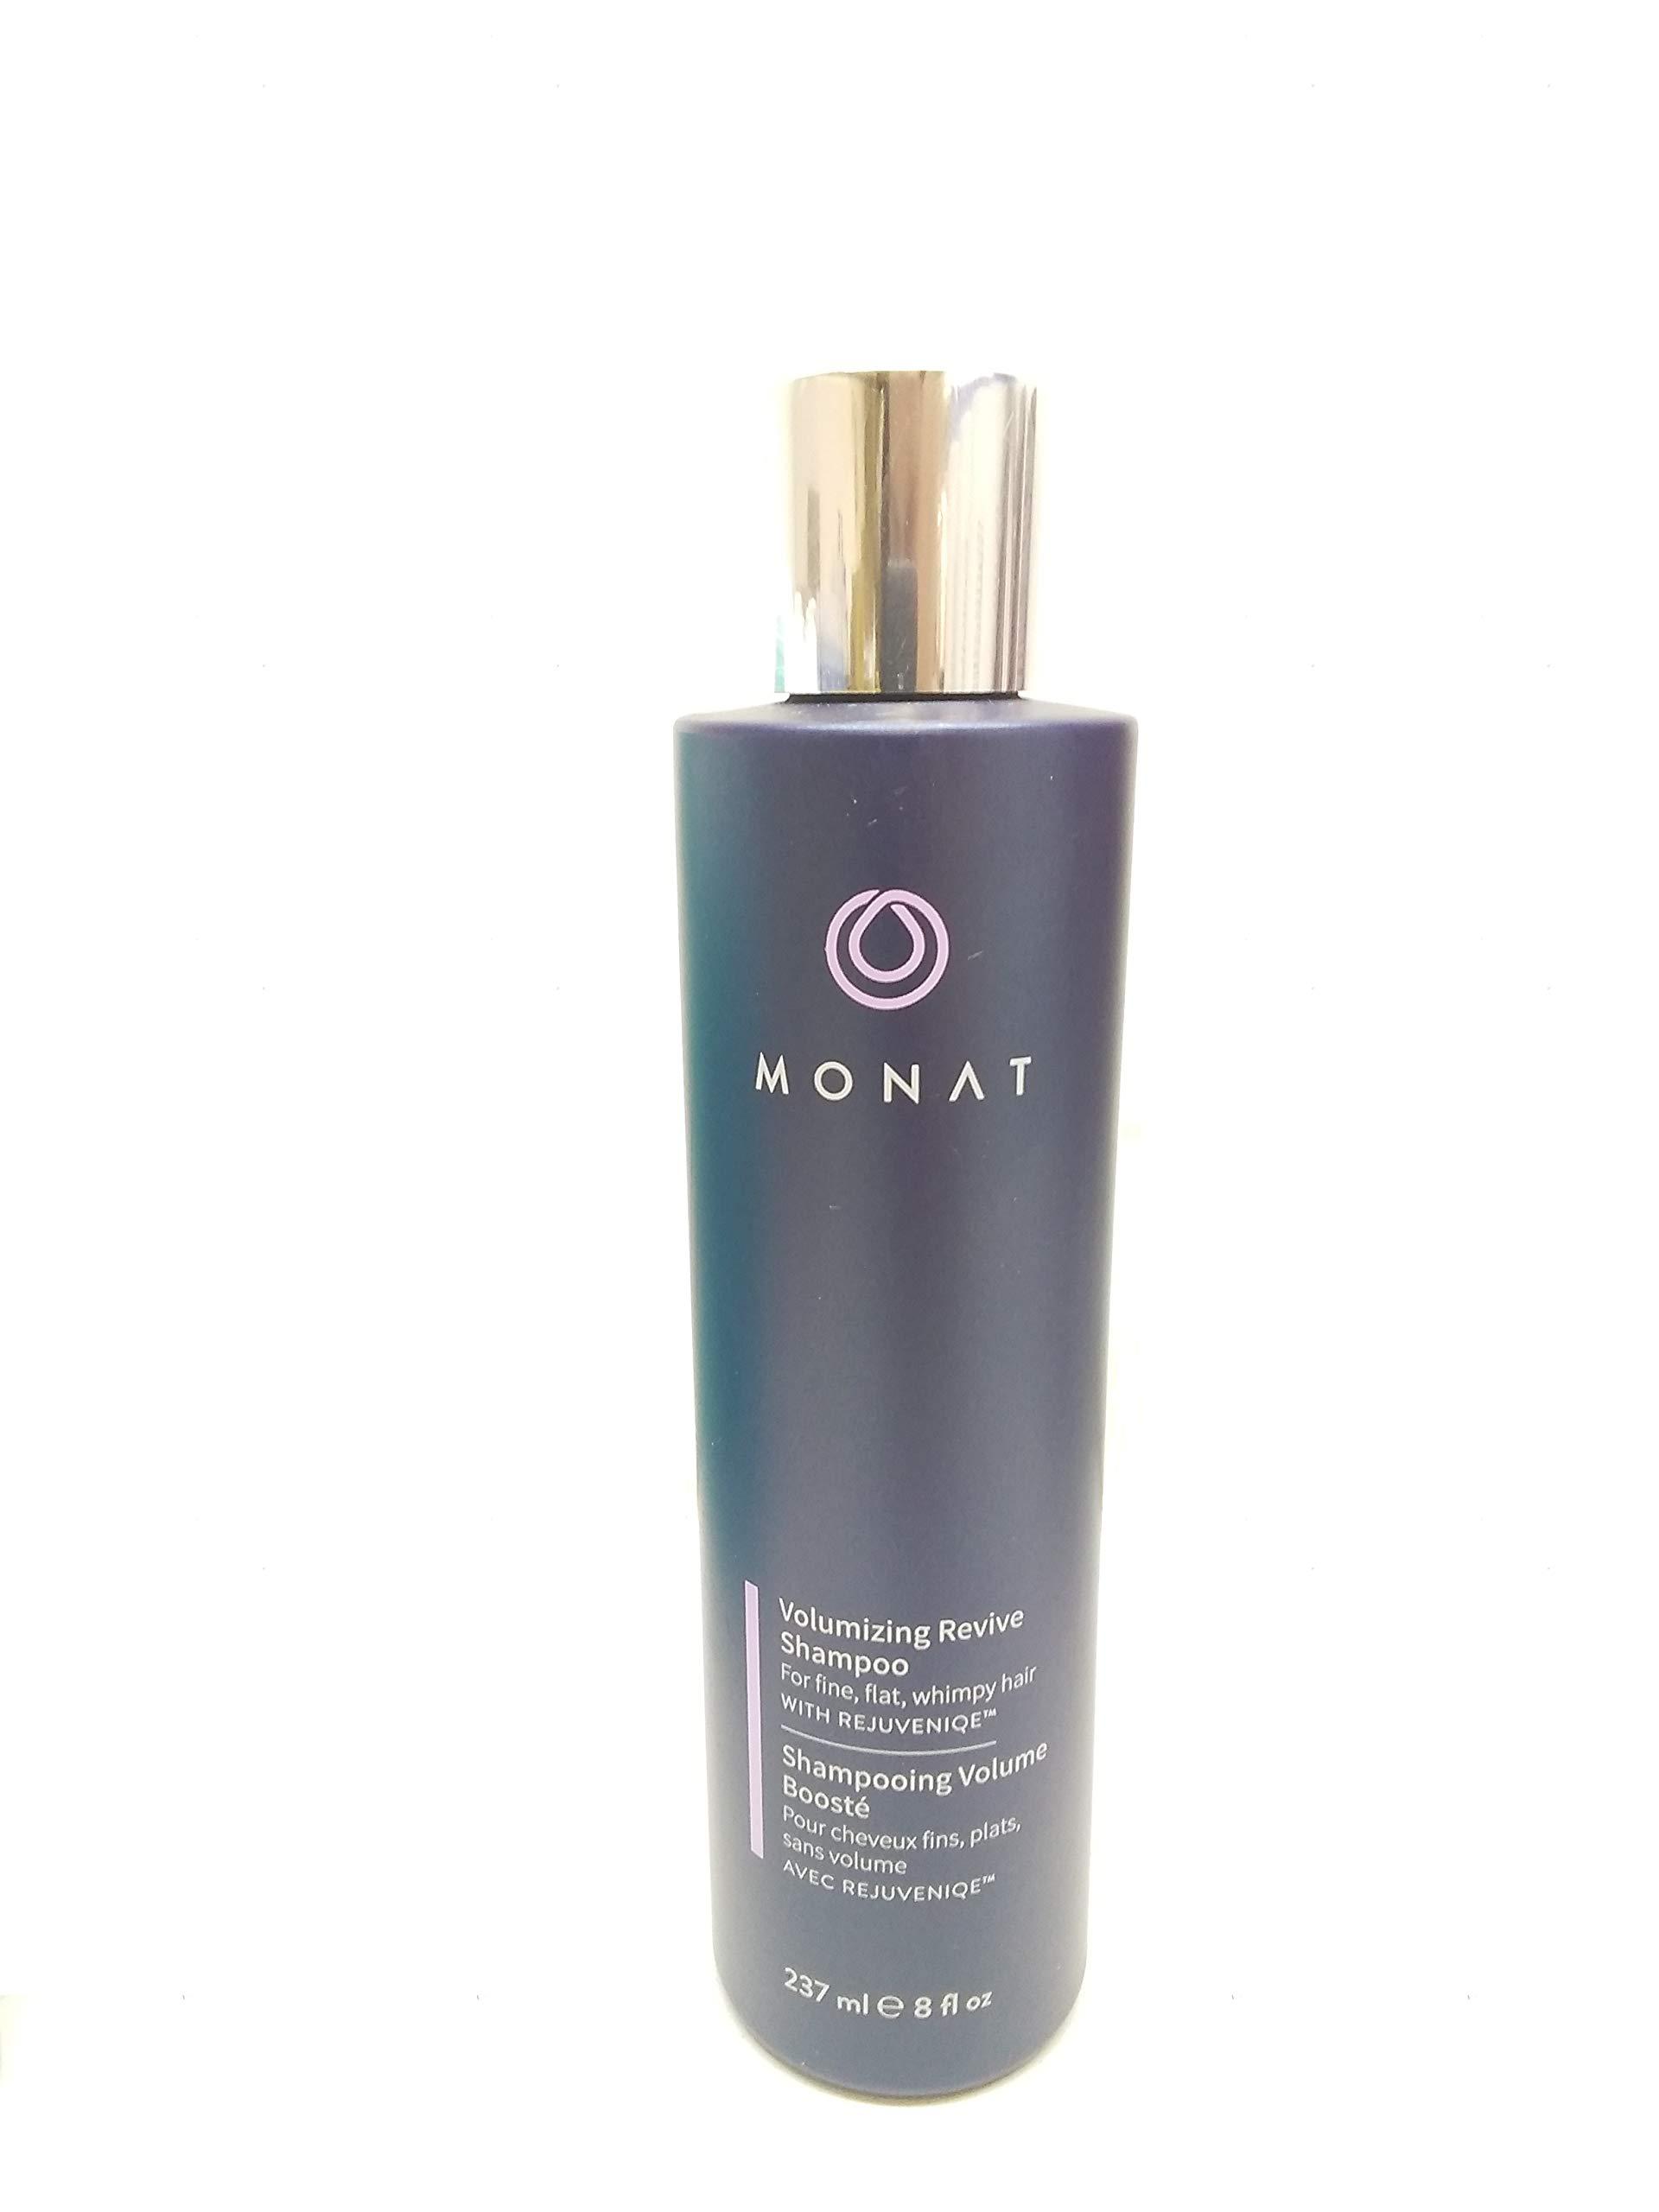 Monat Revive Shampoo and Volume Revitalize Conditioner by Monat